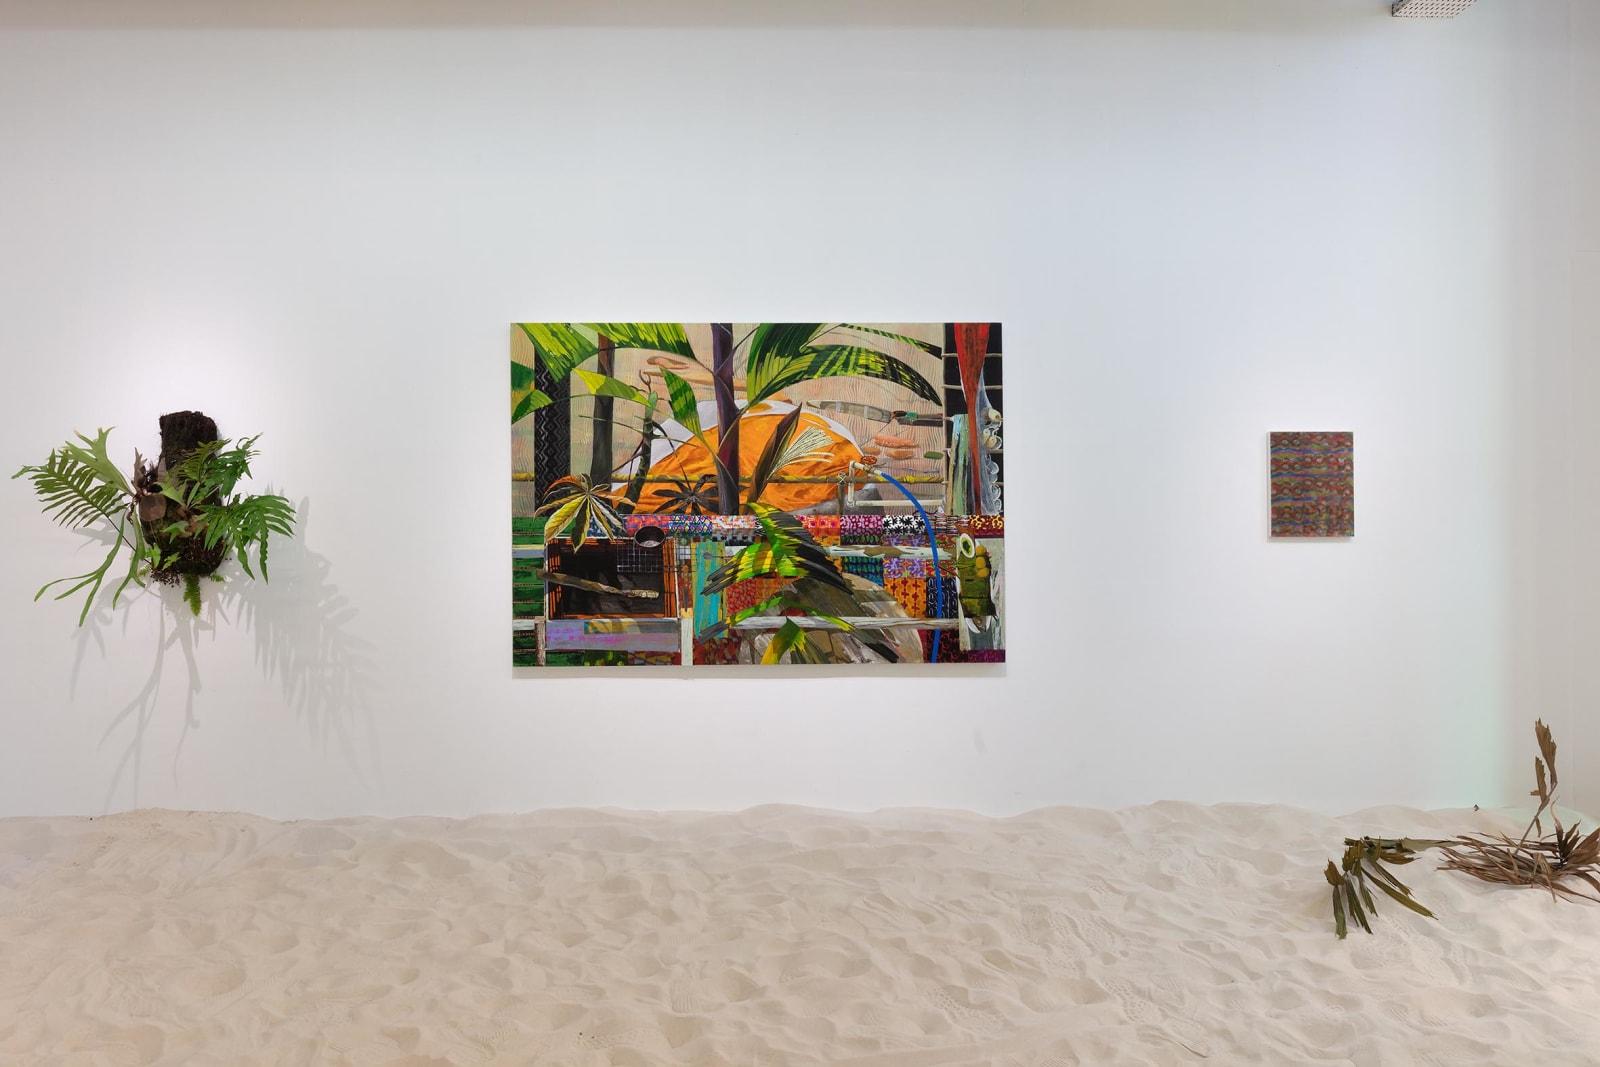 <p><span>Installation view: 'Campo Expandido', Oi Futuro, Rio de Janeiro (2020).</span></p>